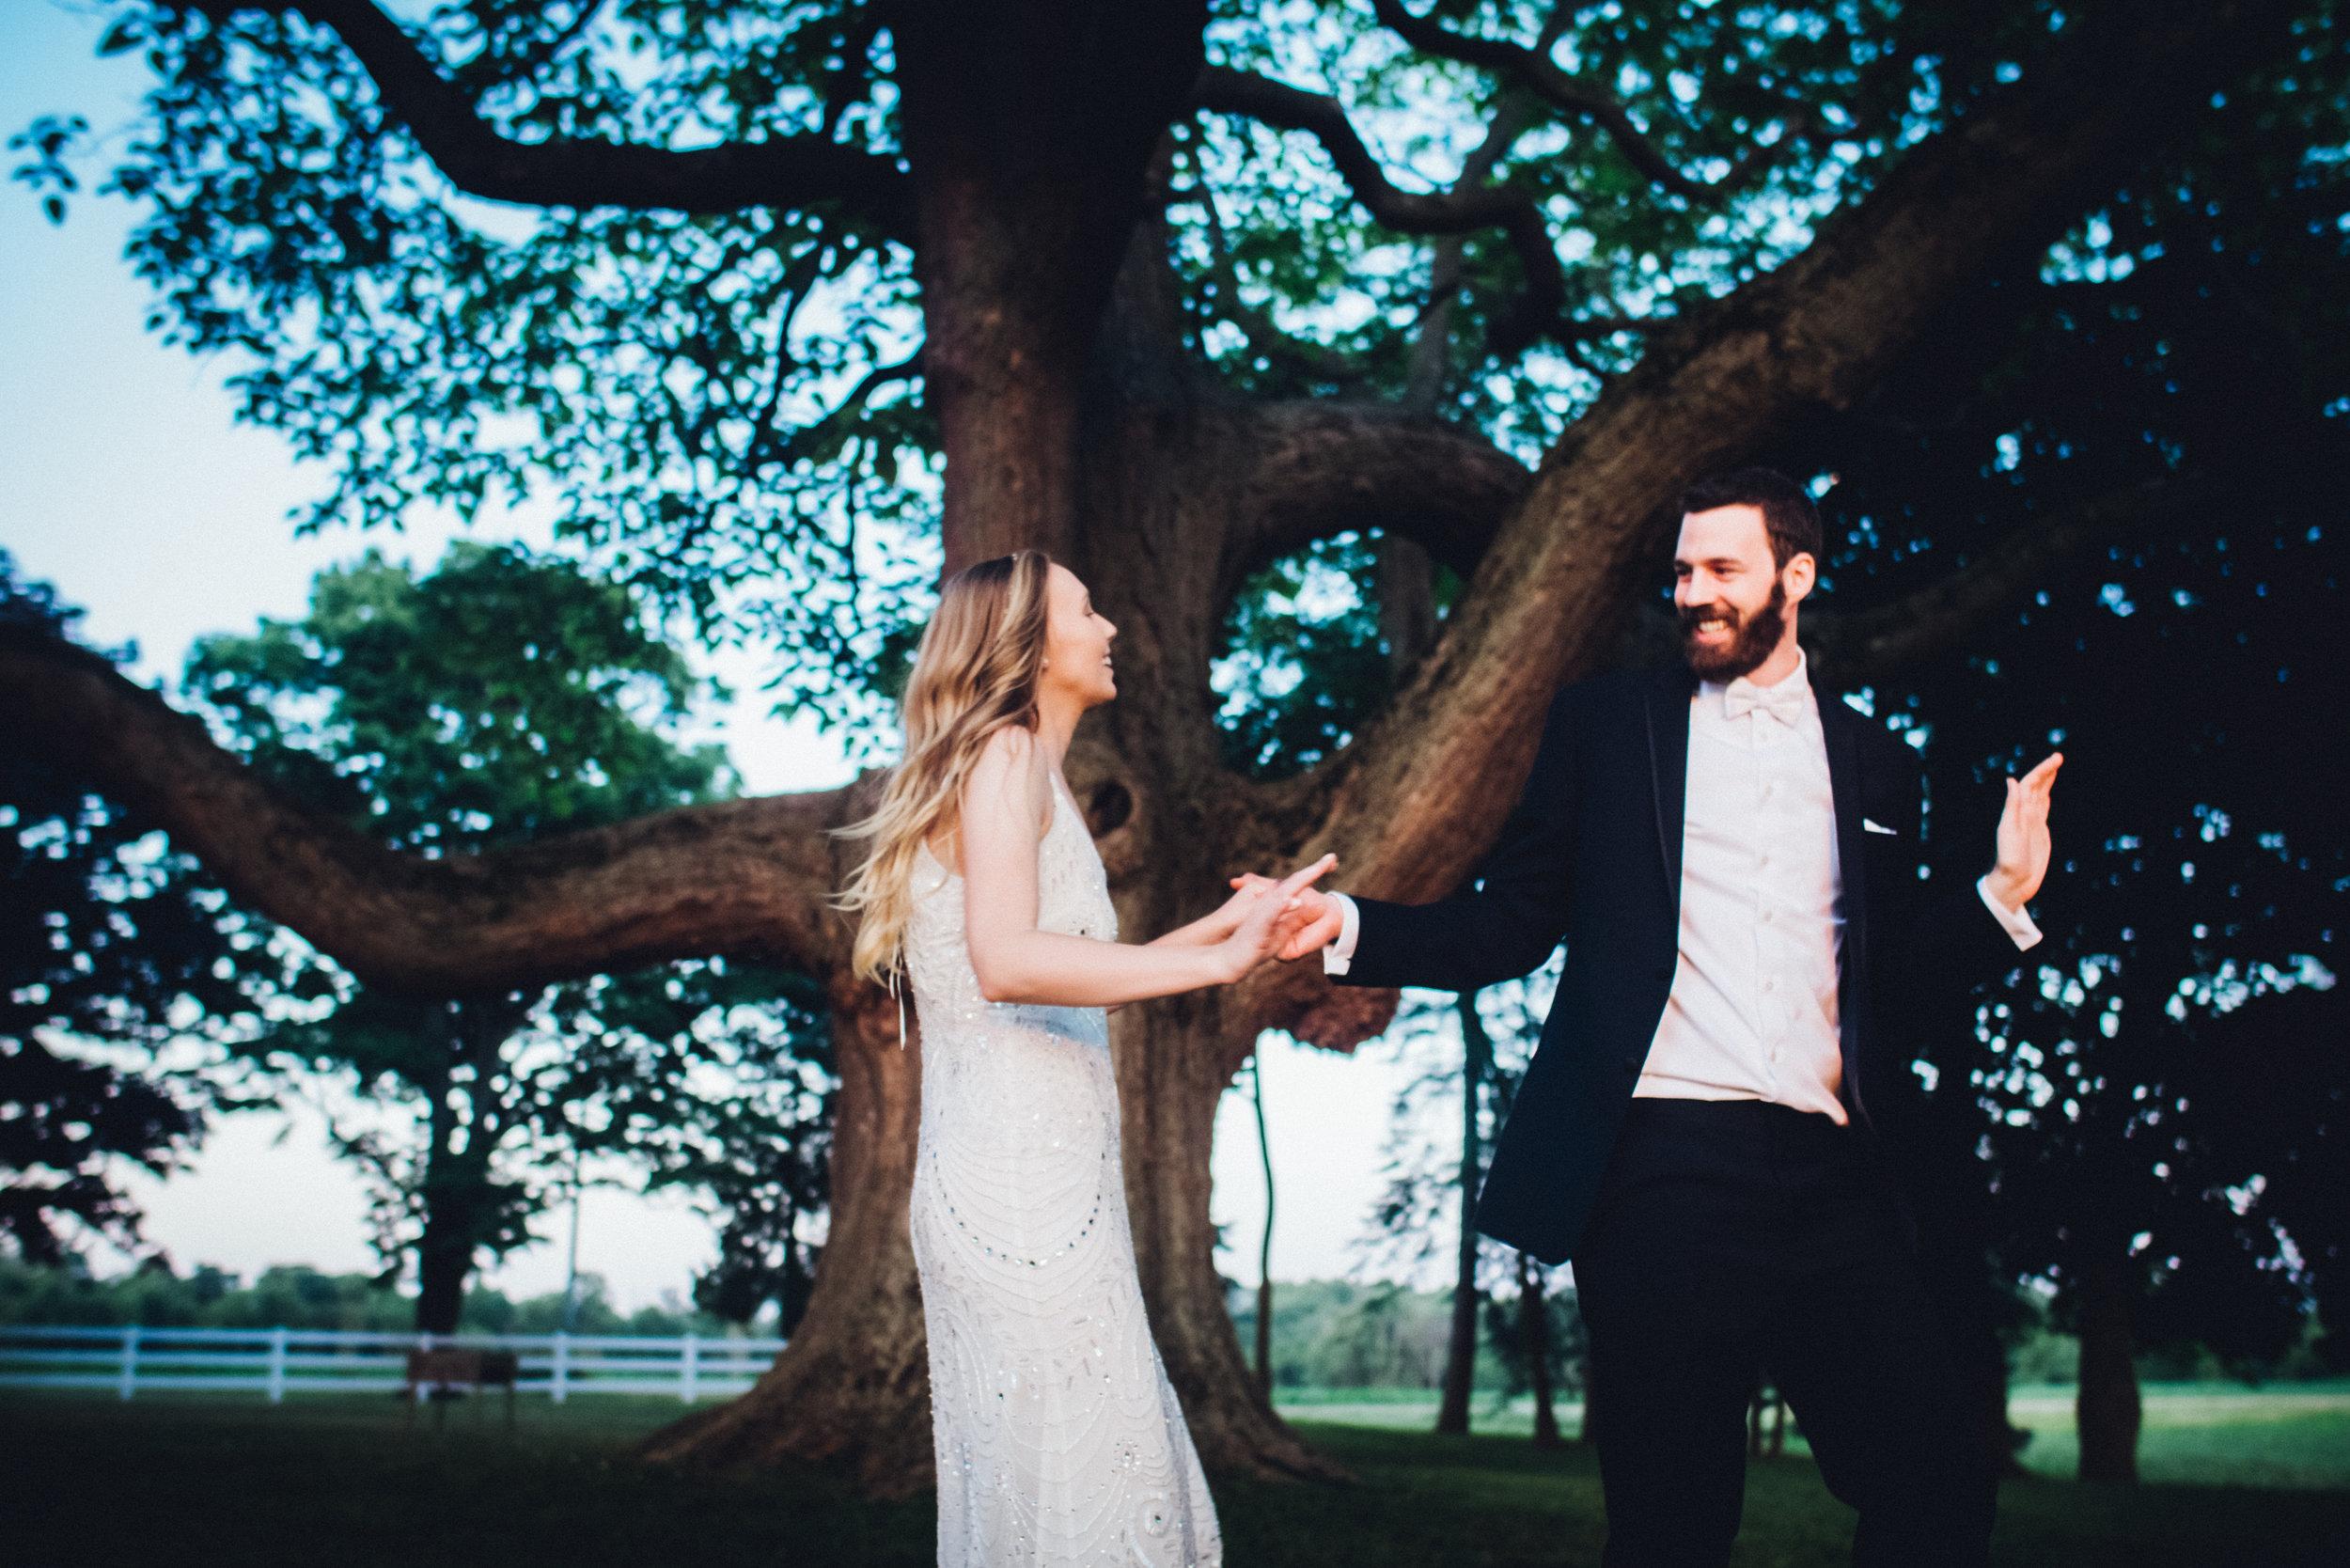 ledwidge-wedding-chicago-michigan-films-film-photos-photography-videography-cinematography-cinematographer-cinematographers-photographers-photography-photographer